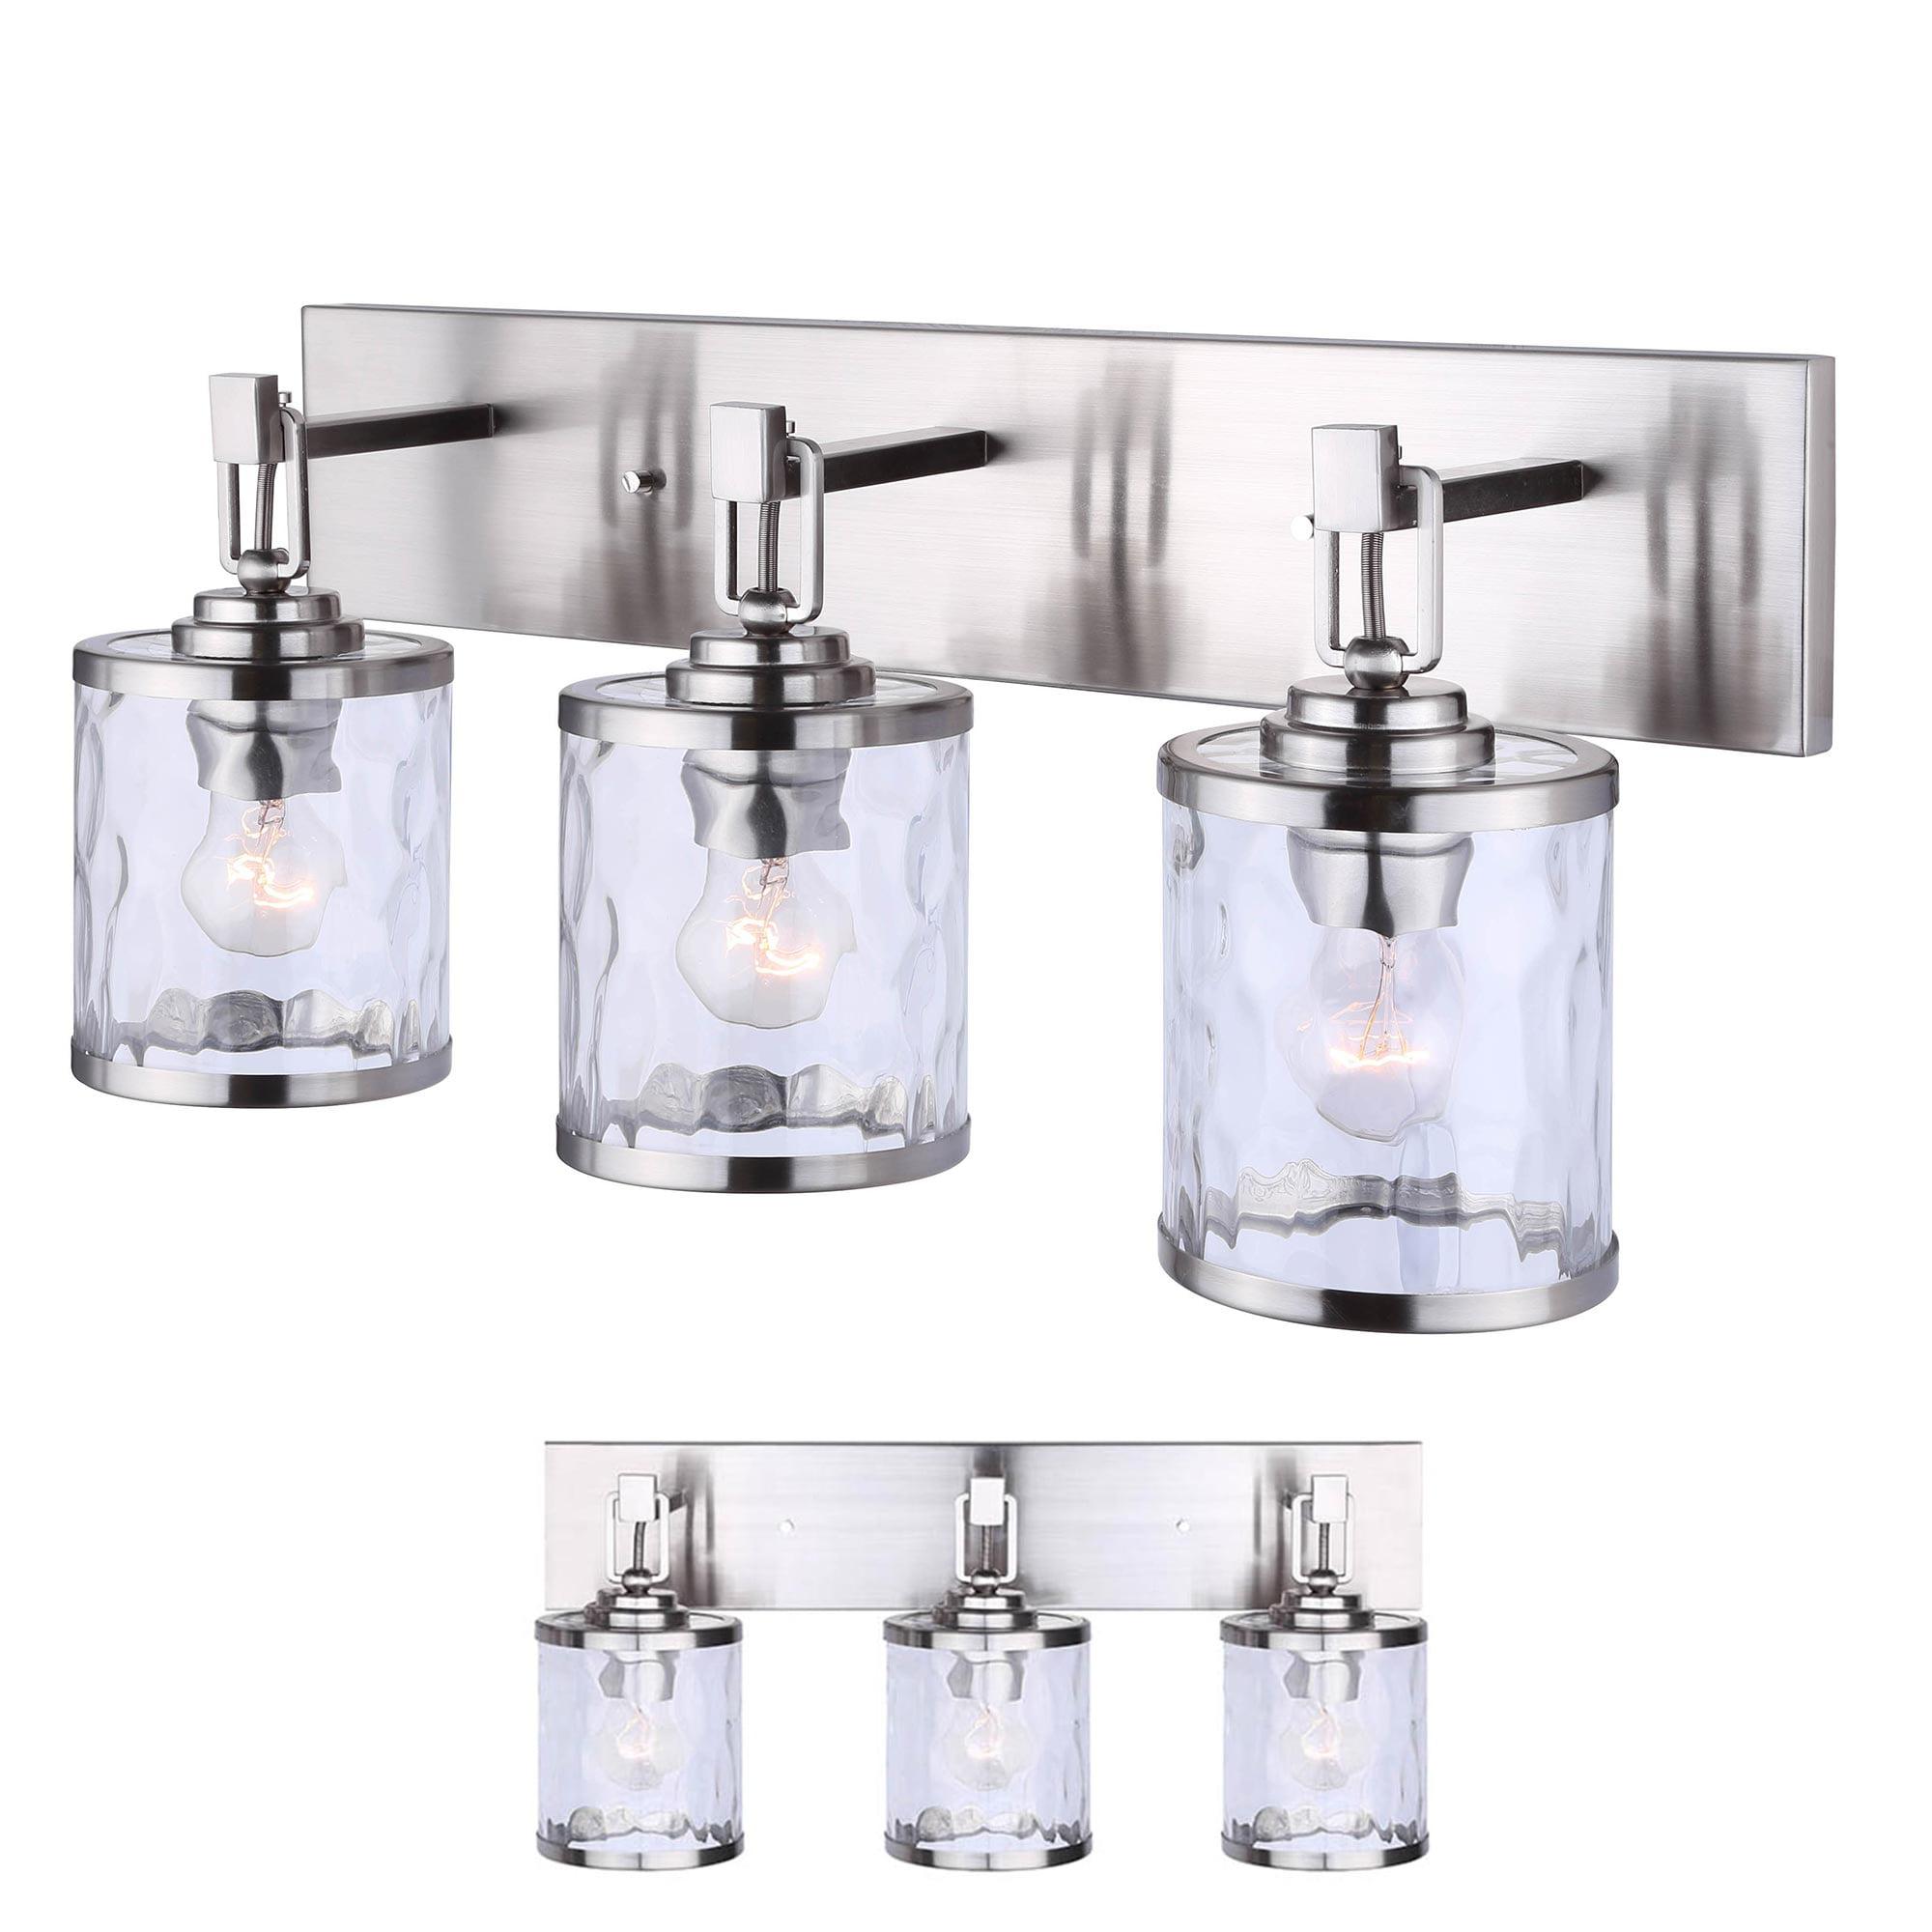 Brushed Nickel Vanity 3 Light Bathroom Fixture Bath Bar, Clear Watermark Glass Globes by How Plumb